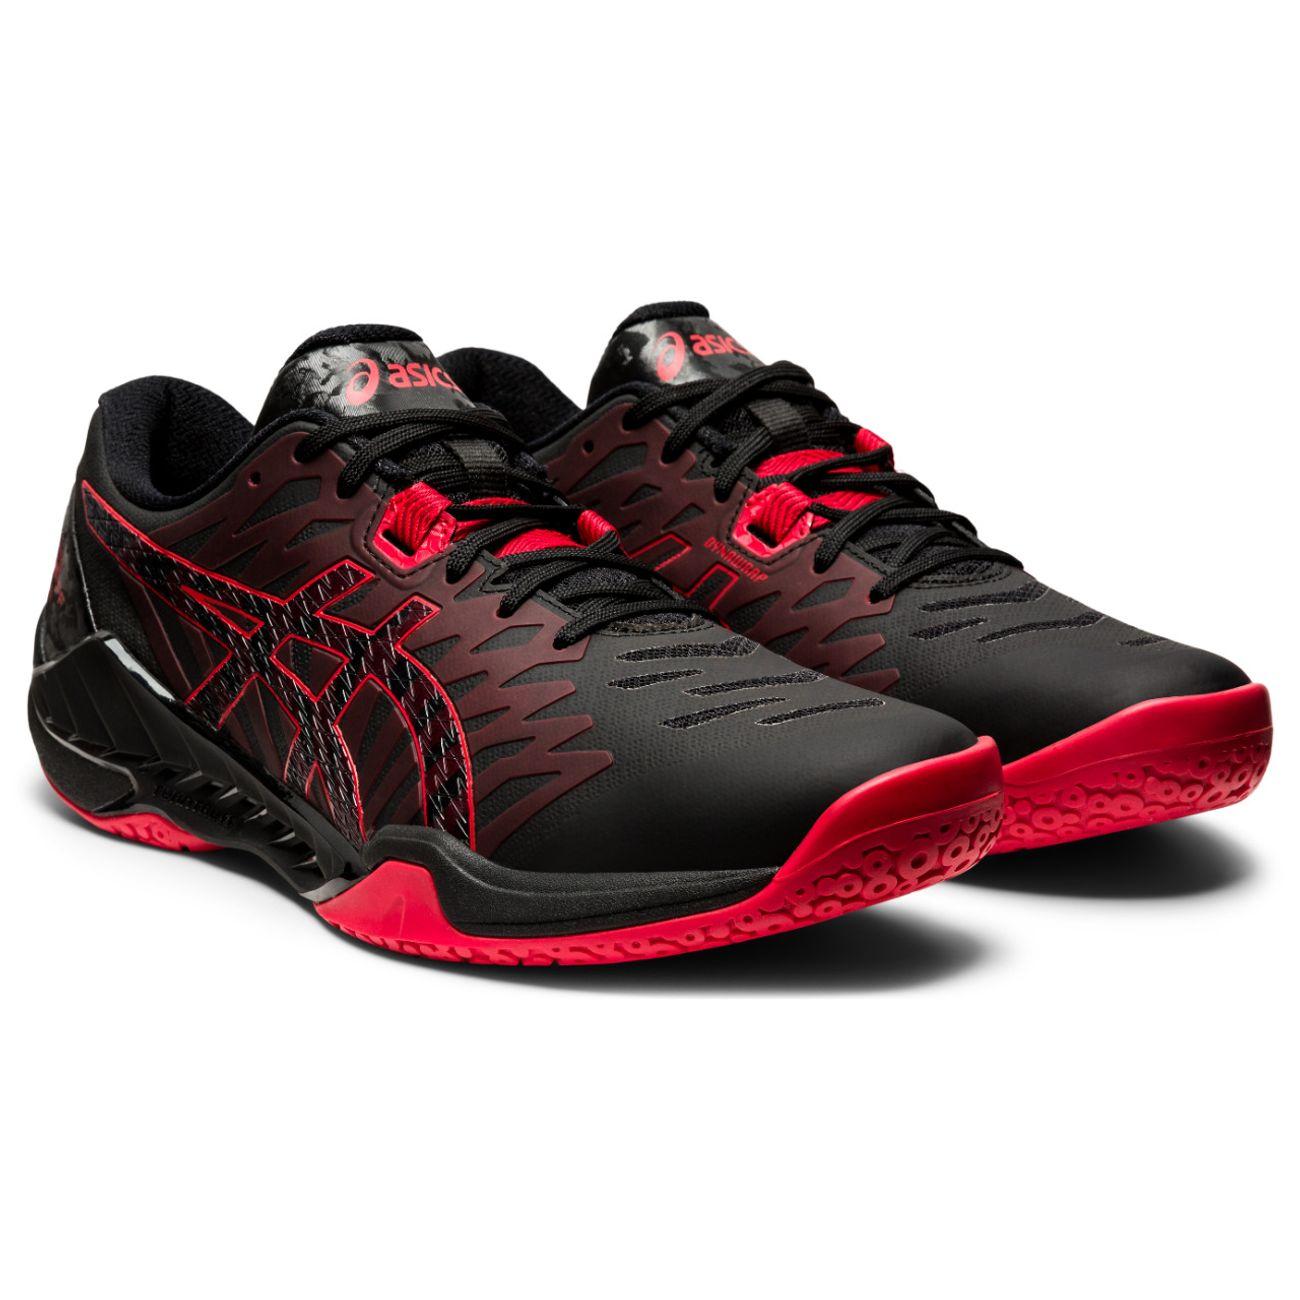 Handball homme ASICS Chaussures Asics Blast FF 2